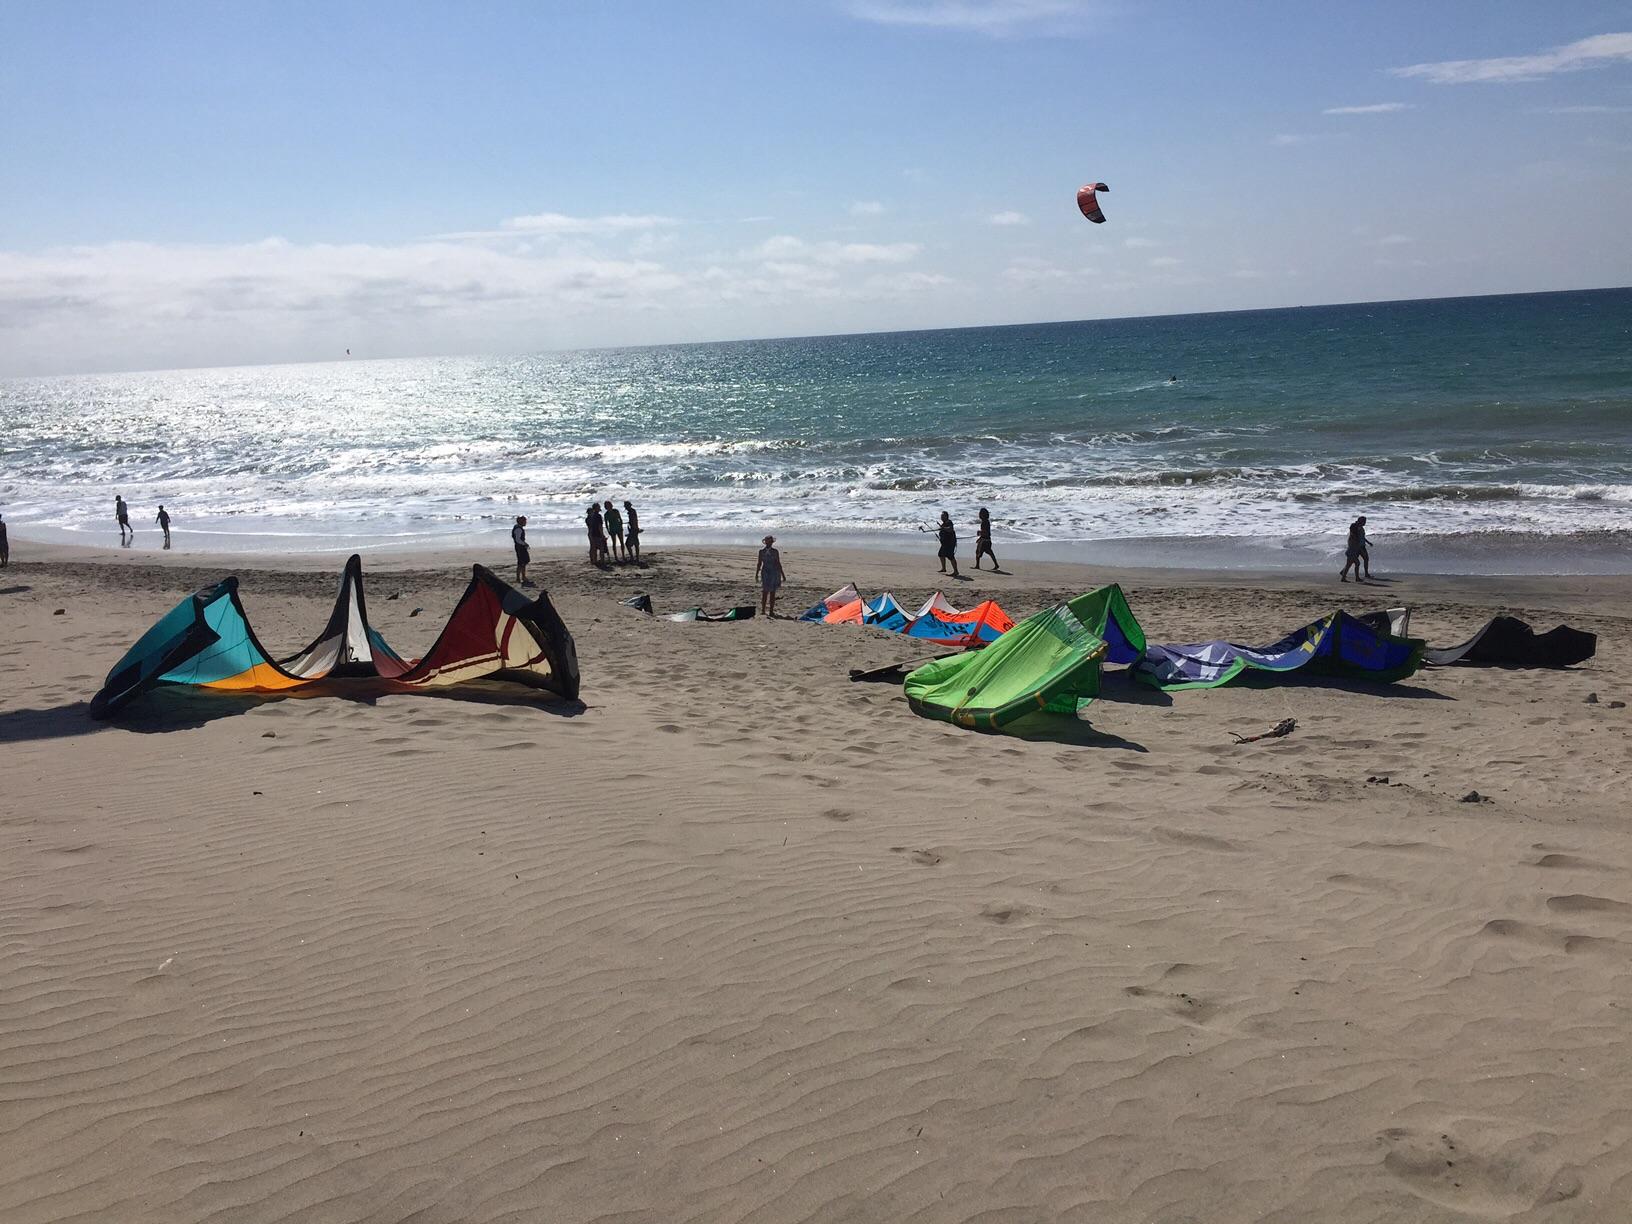 Kitesurfing on Santa Marianita beach, Ecuador